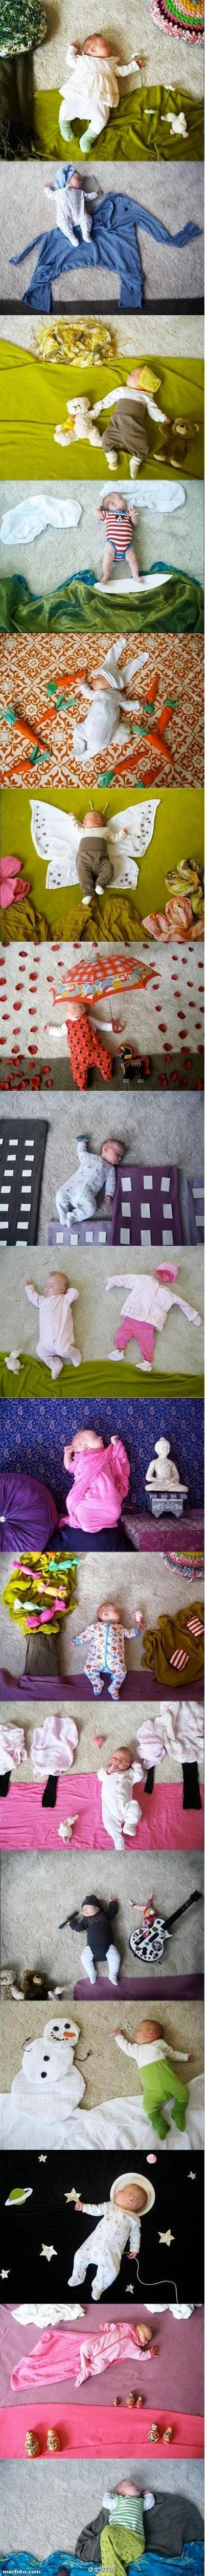 Babies Creative cute